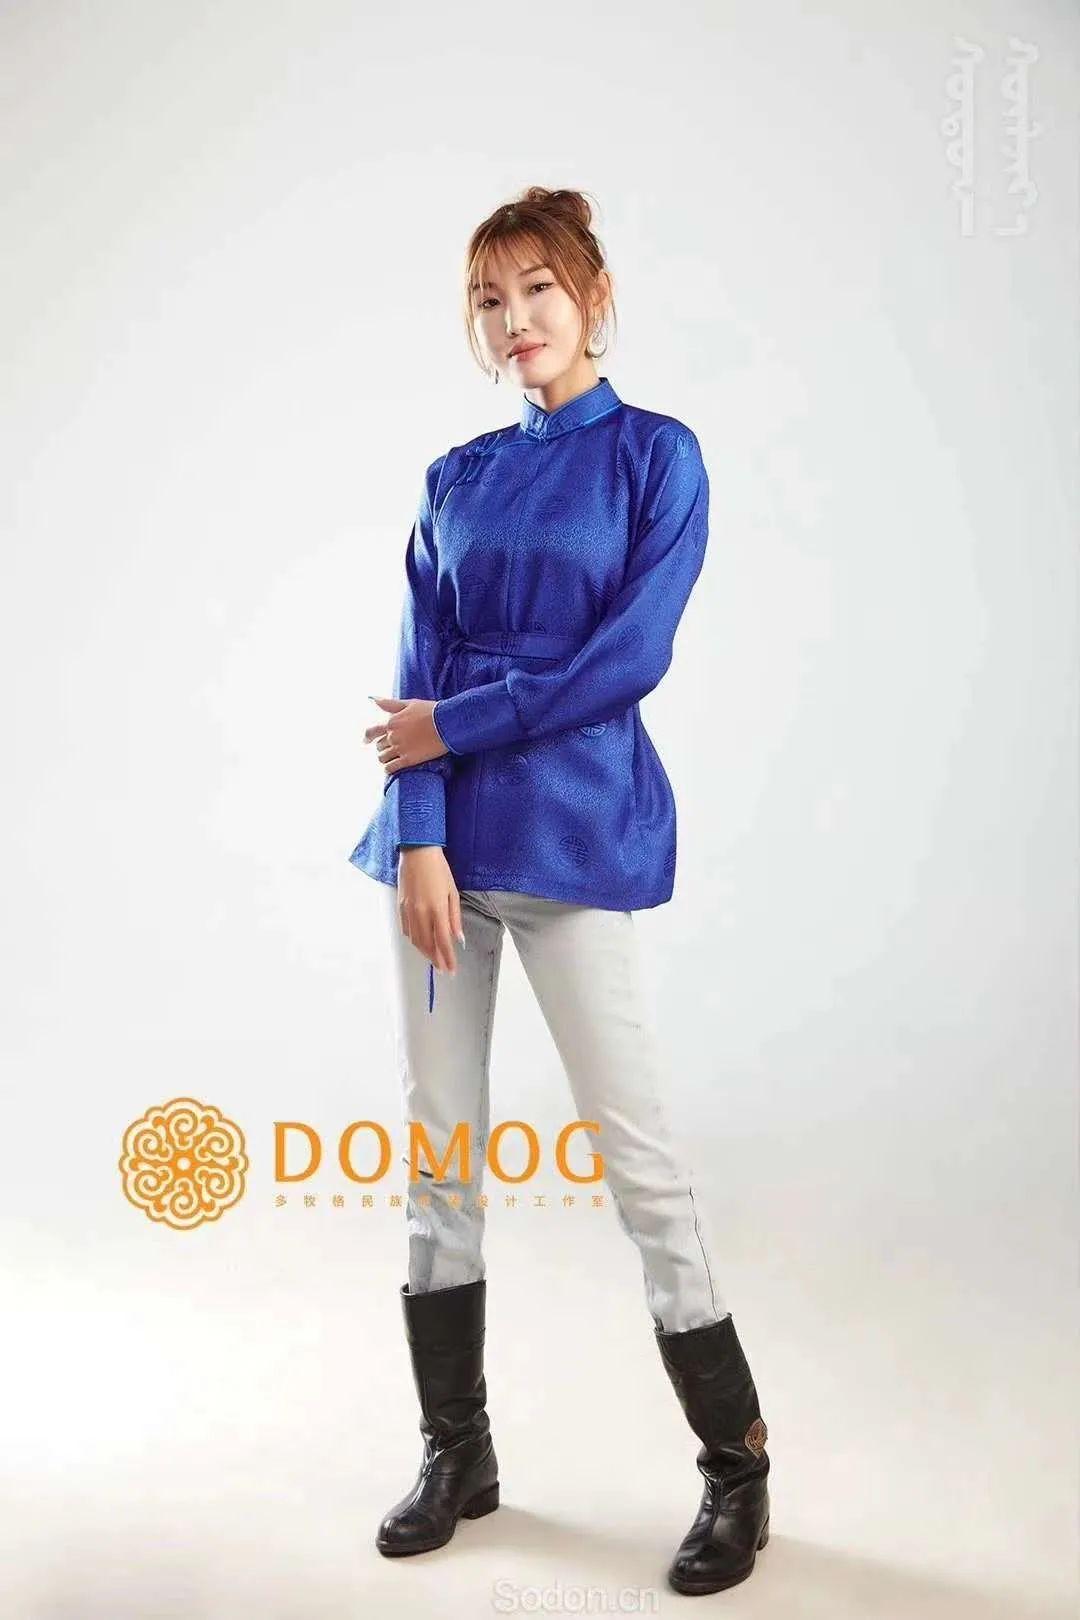 DOMOG 蒙古时装2020新款,民族与时尚的融合 第35张 DOMOG 蒙古时装2020新款,民族与时尚的融合 蒙古服饰